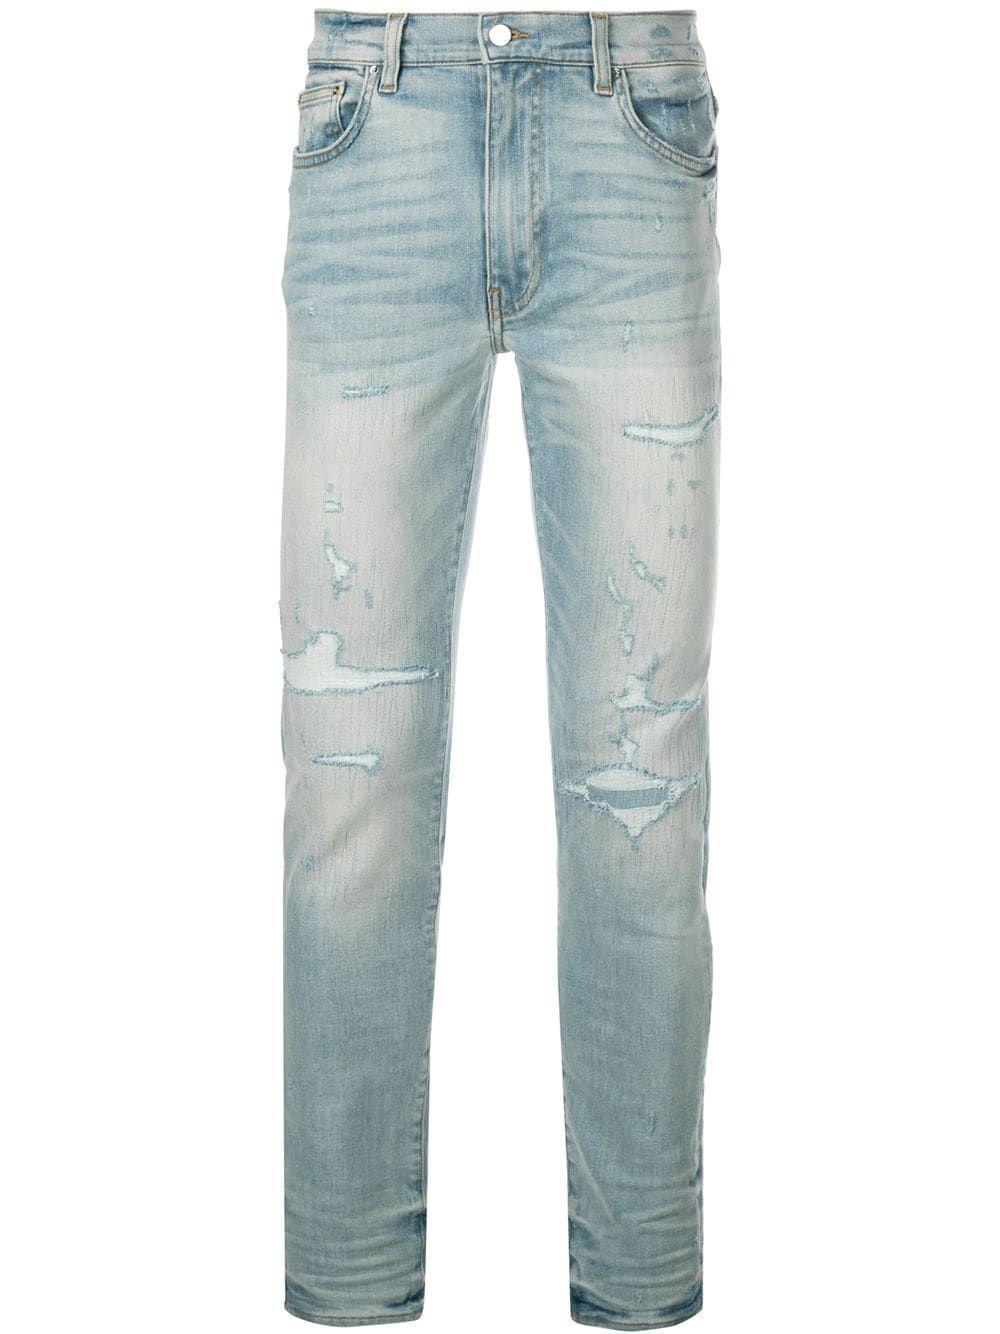 8b7754ce AMIRI AMIRI BOOTCUT SKINNY JEANS - BLUE. #amiri #cloth | Amiri in 2019 |  Jeans, Skinny jeans, Stretch denim